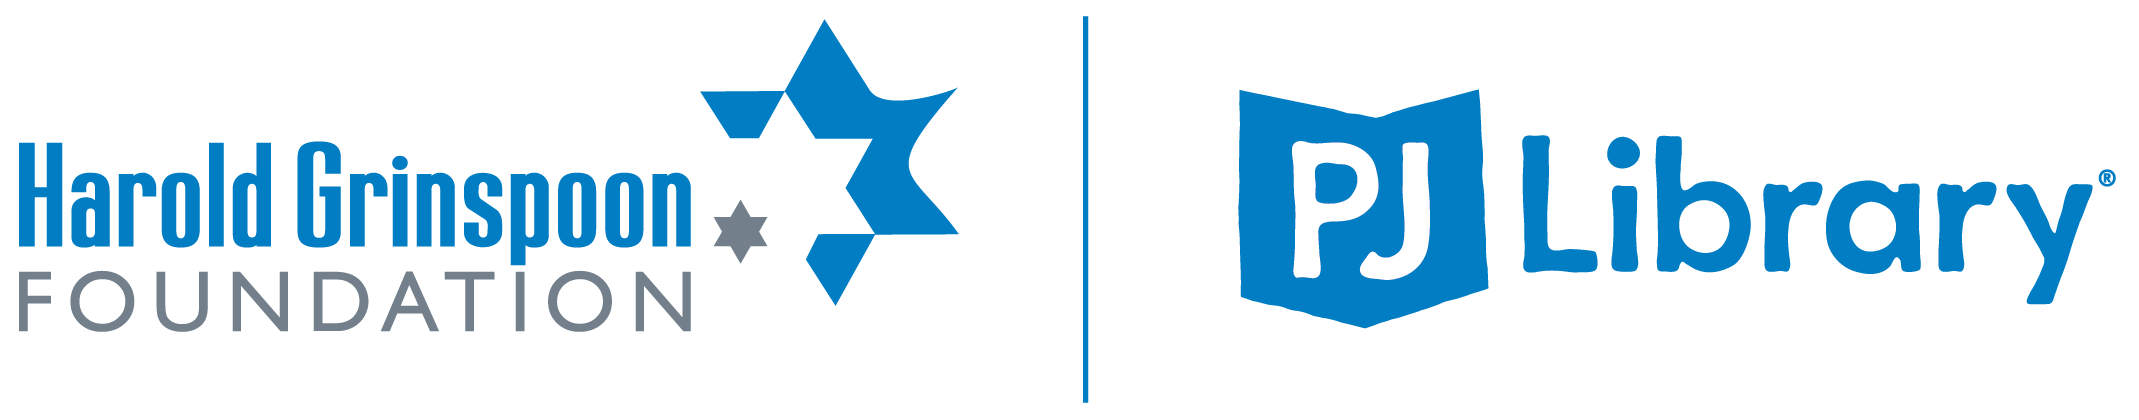 HGF-PJL logo lockup.png